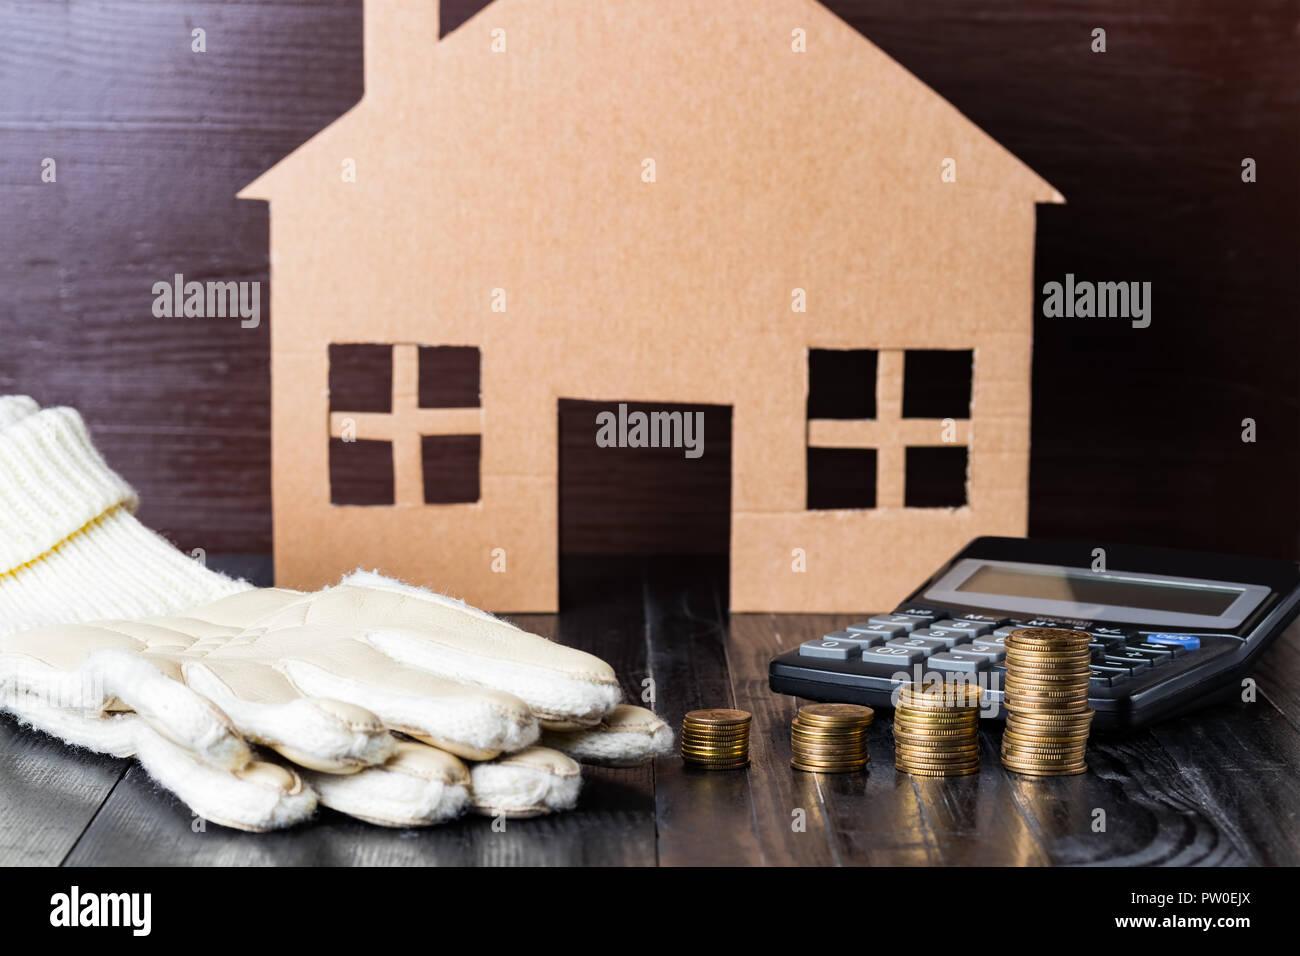 Home Wärme Oder Ausgaben Konzept Warme Handschuhe Münze Stapel